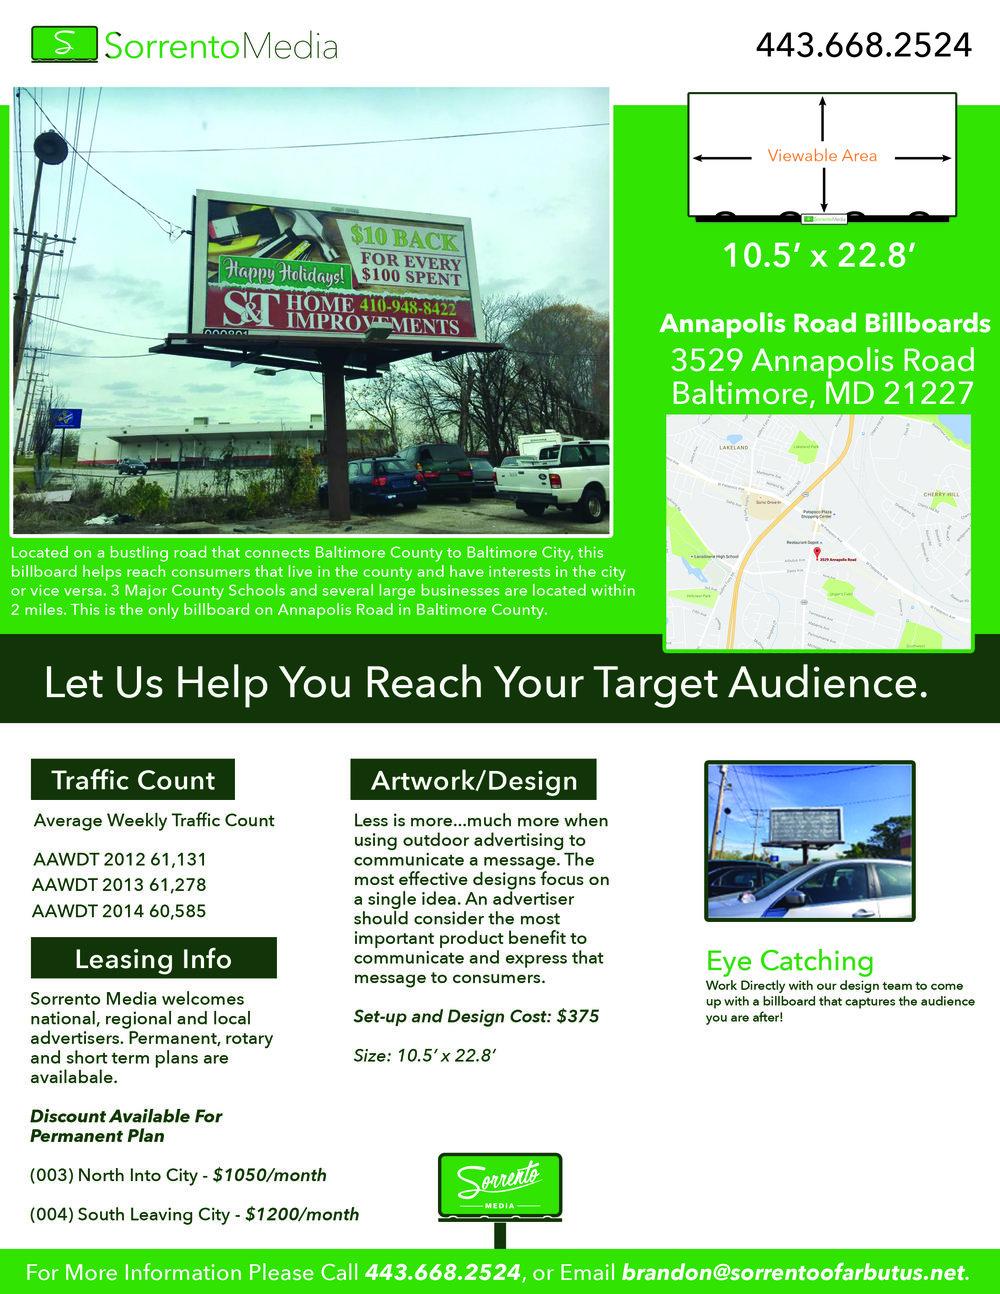 Annapolis Road Billboards Spec Sheet.jpg